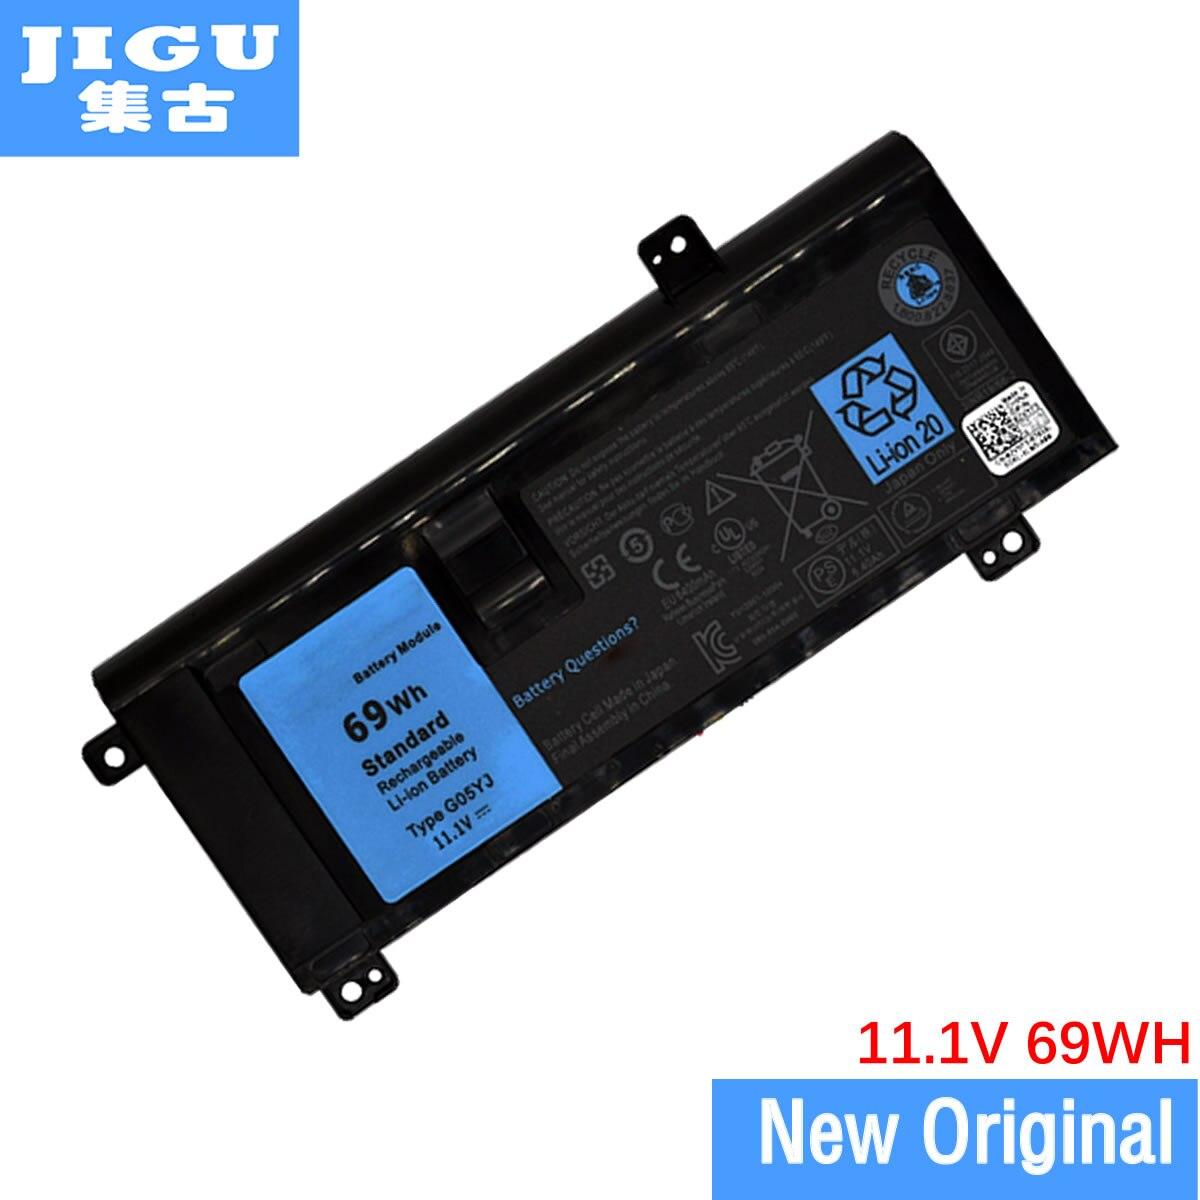 JIGU 08X70T 8X70T G05YJ GO5YJ Y3PN0 الأصلي بطارية كمبيوتر محمول لديل من Alienware 14 14D 14X A14 M14 M14X ALW14D